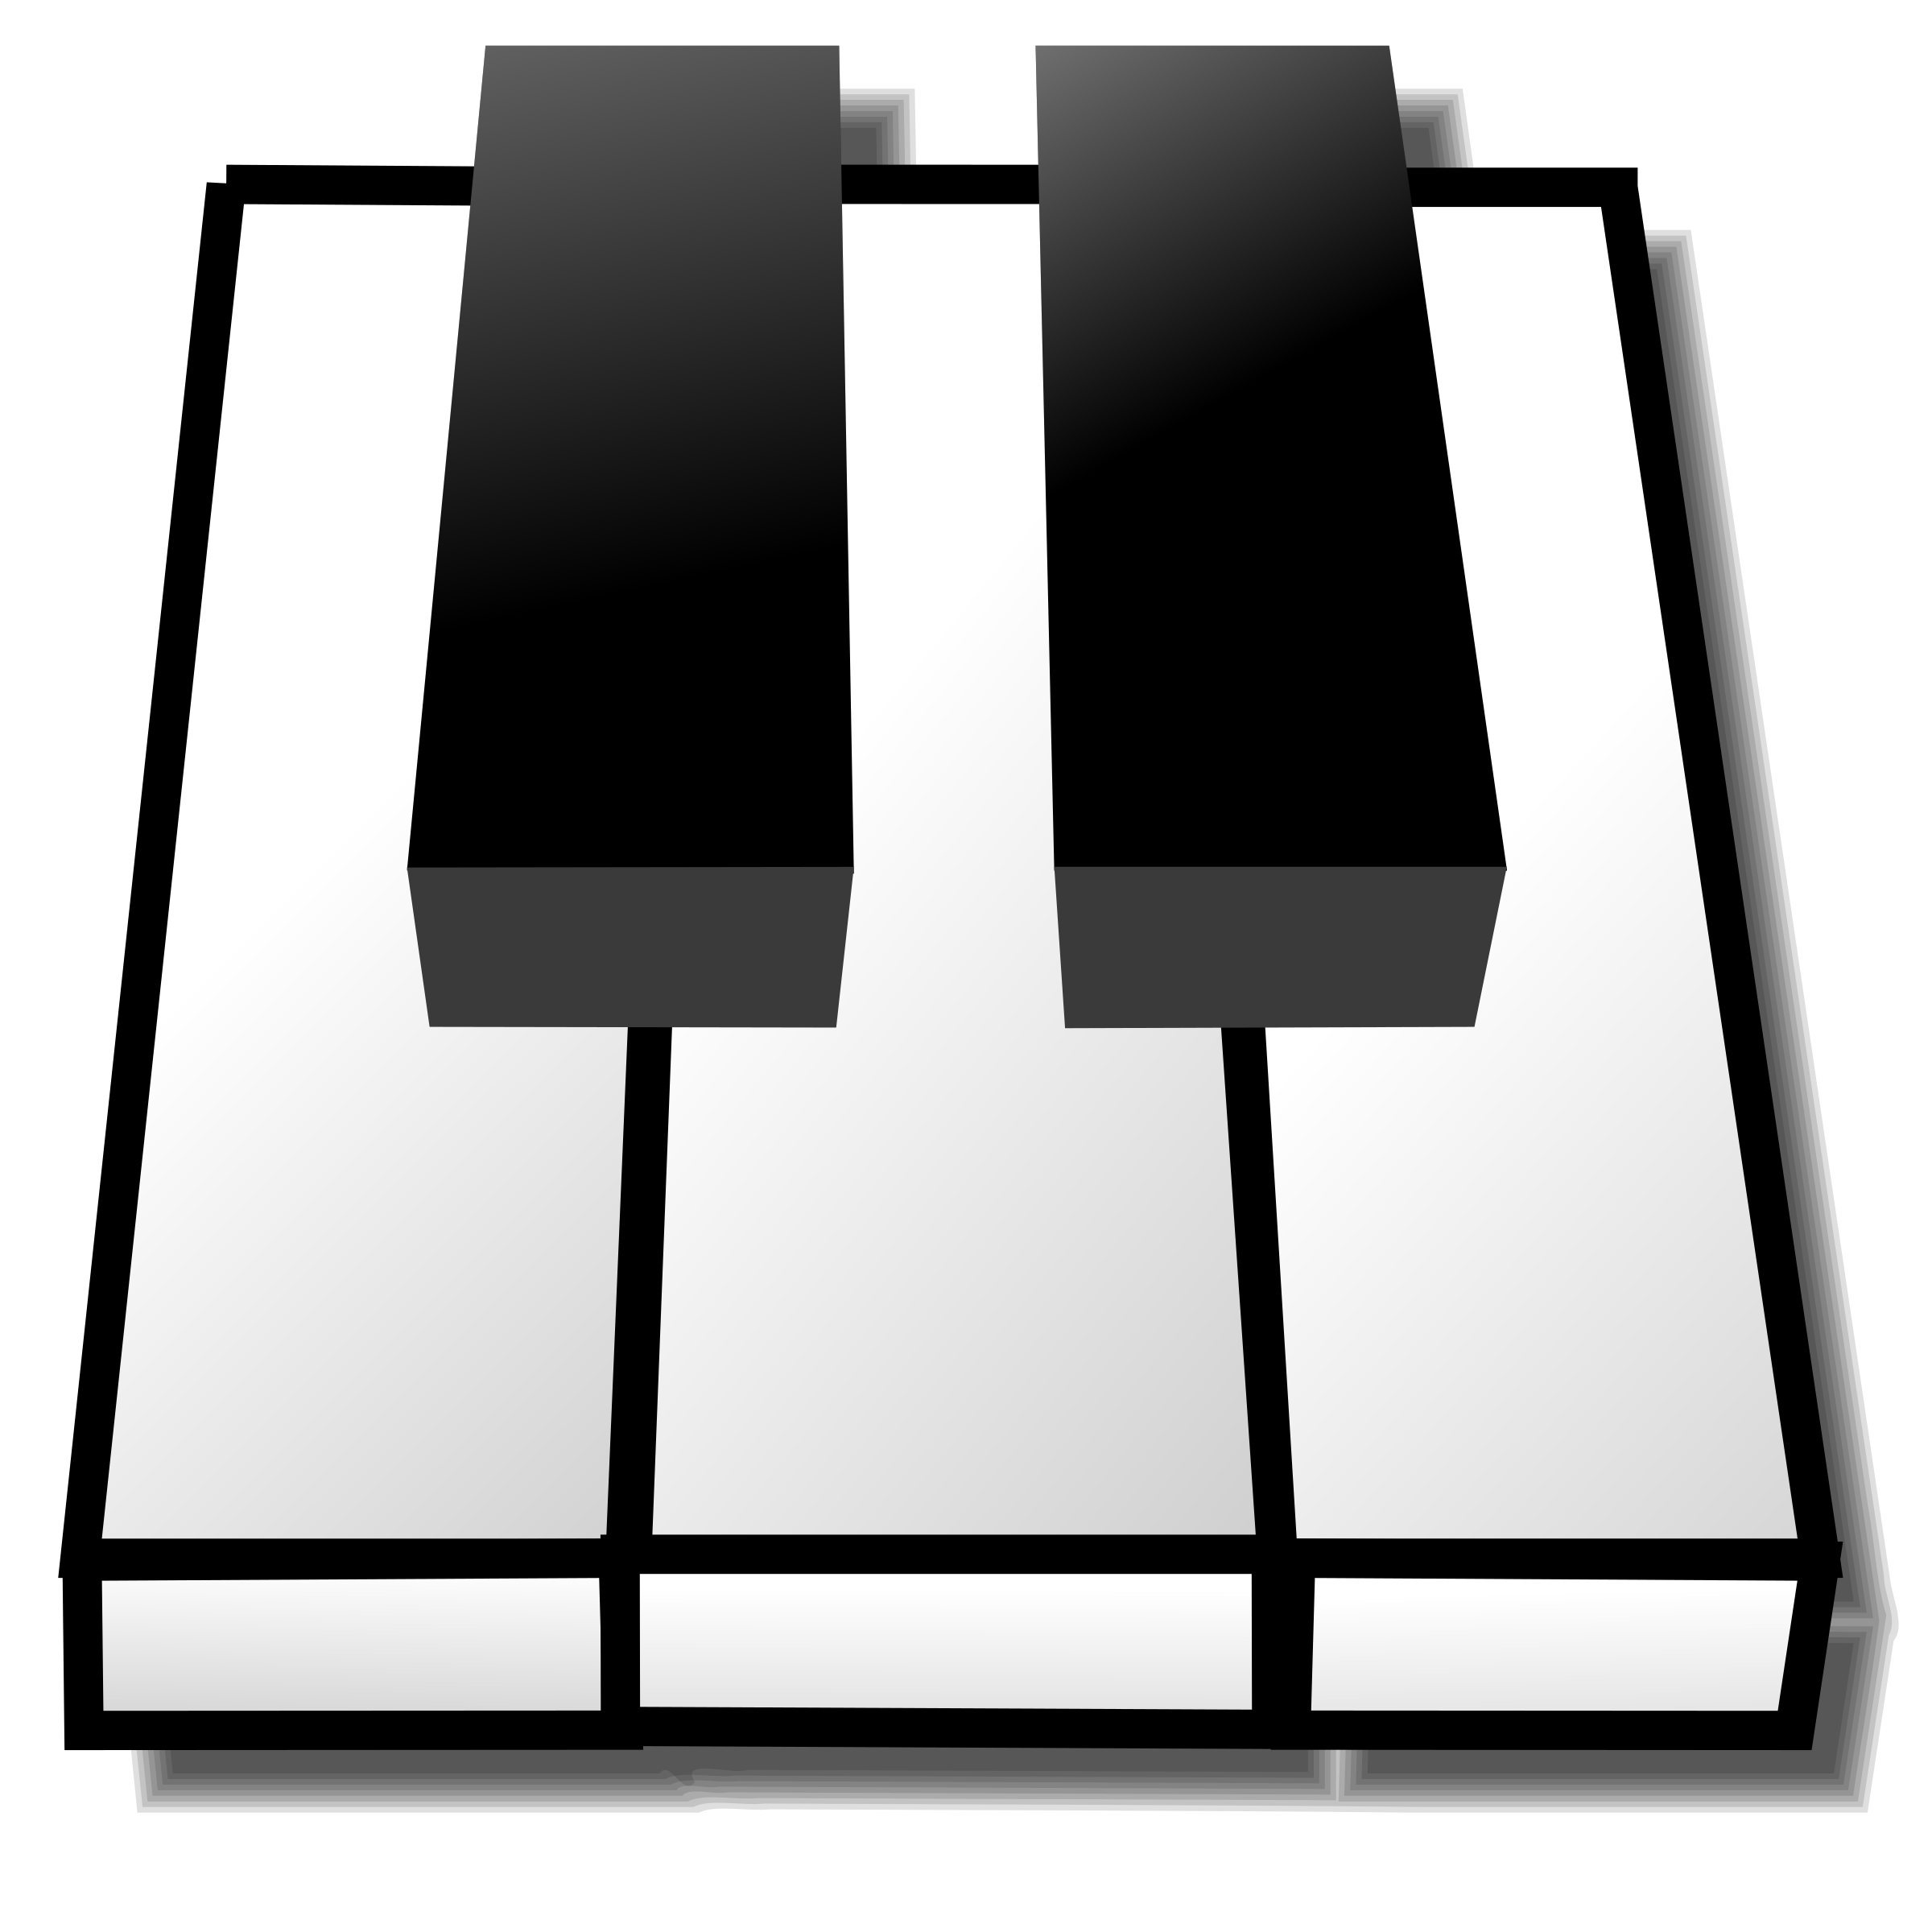 Sheet Music clipart advanced PDF Band Solos Downloads Sheet